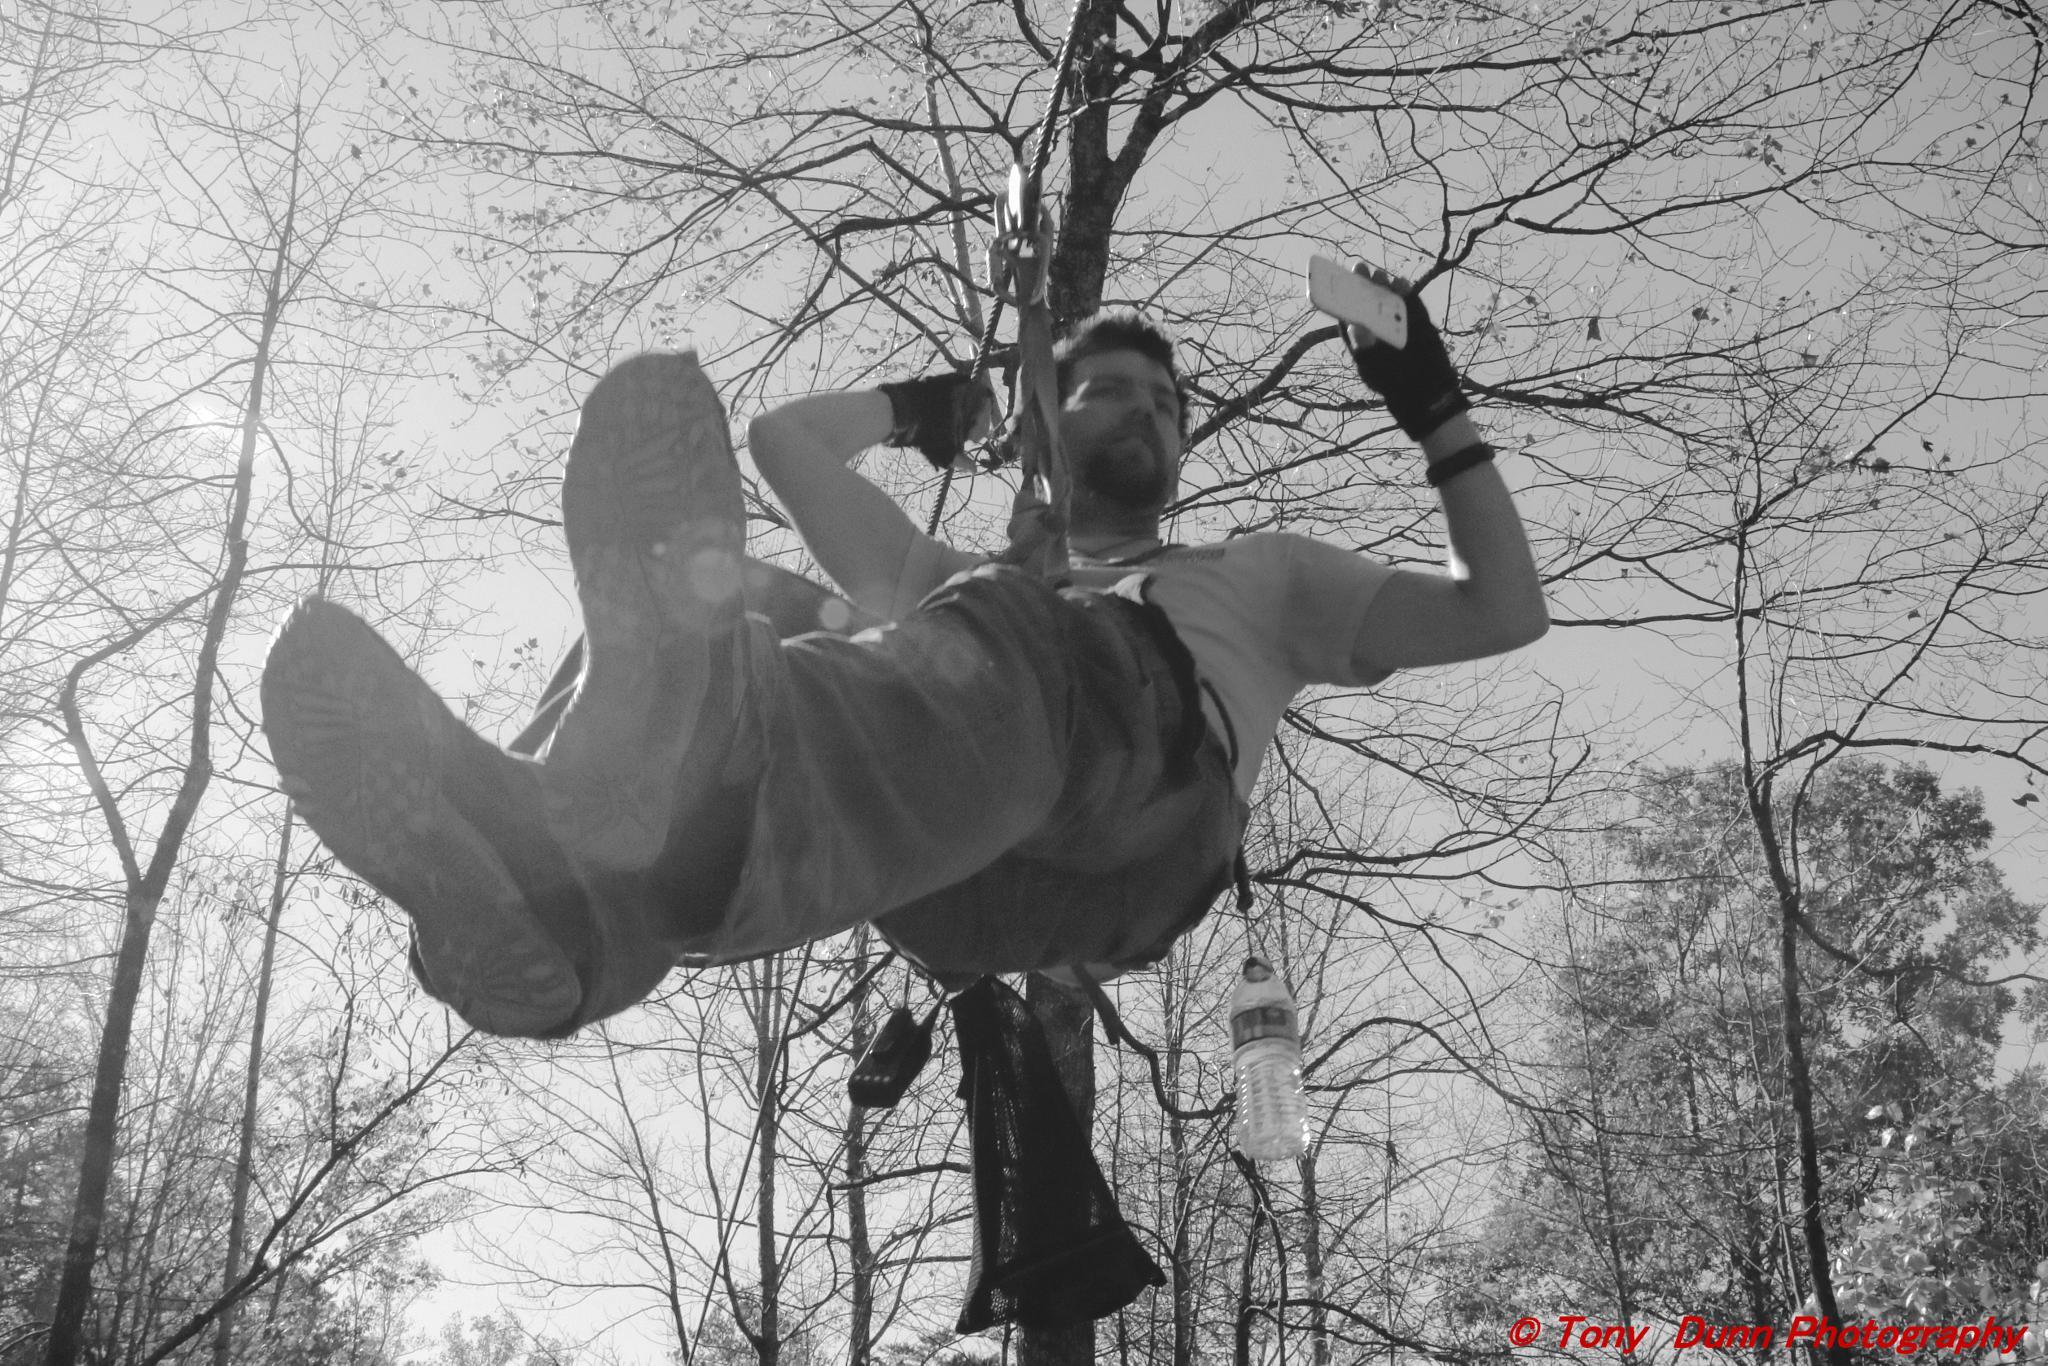 Zipline by Tony Dunn